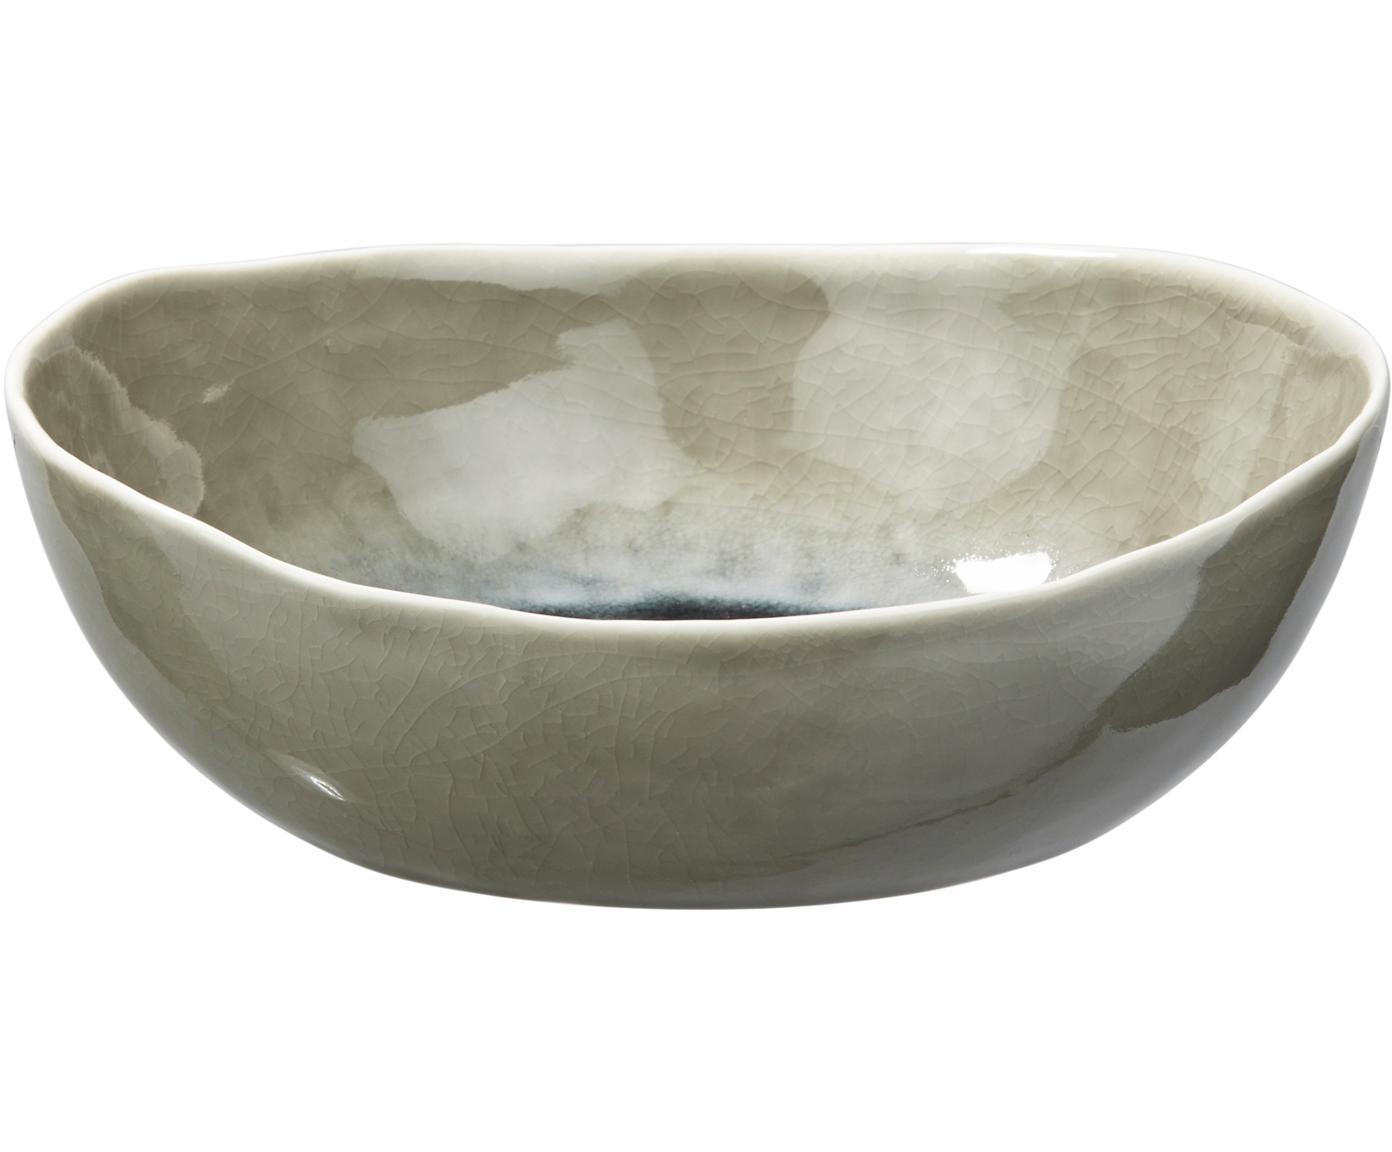 Schalen Porcelino Sea, 6 Stück, Porzellan, Graugrün, Beige, Ø 20 x H 5 cm